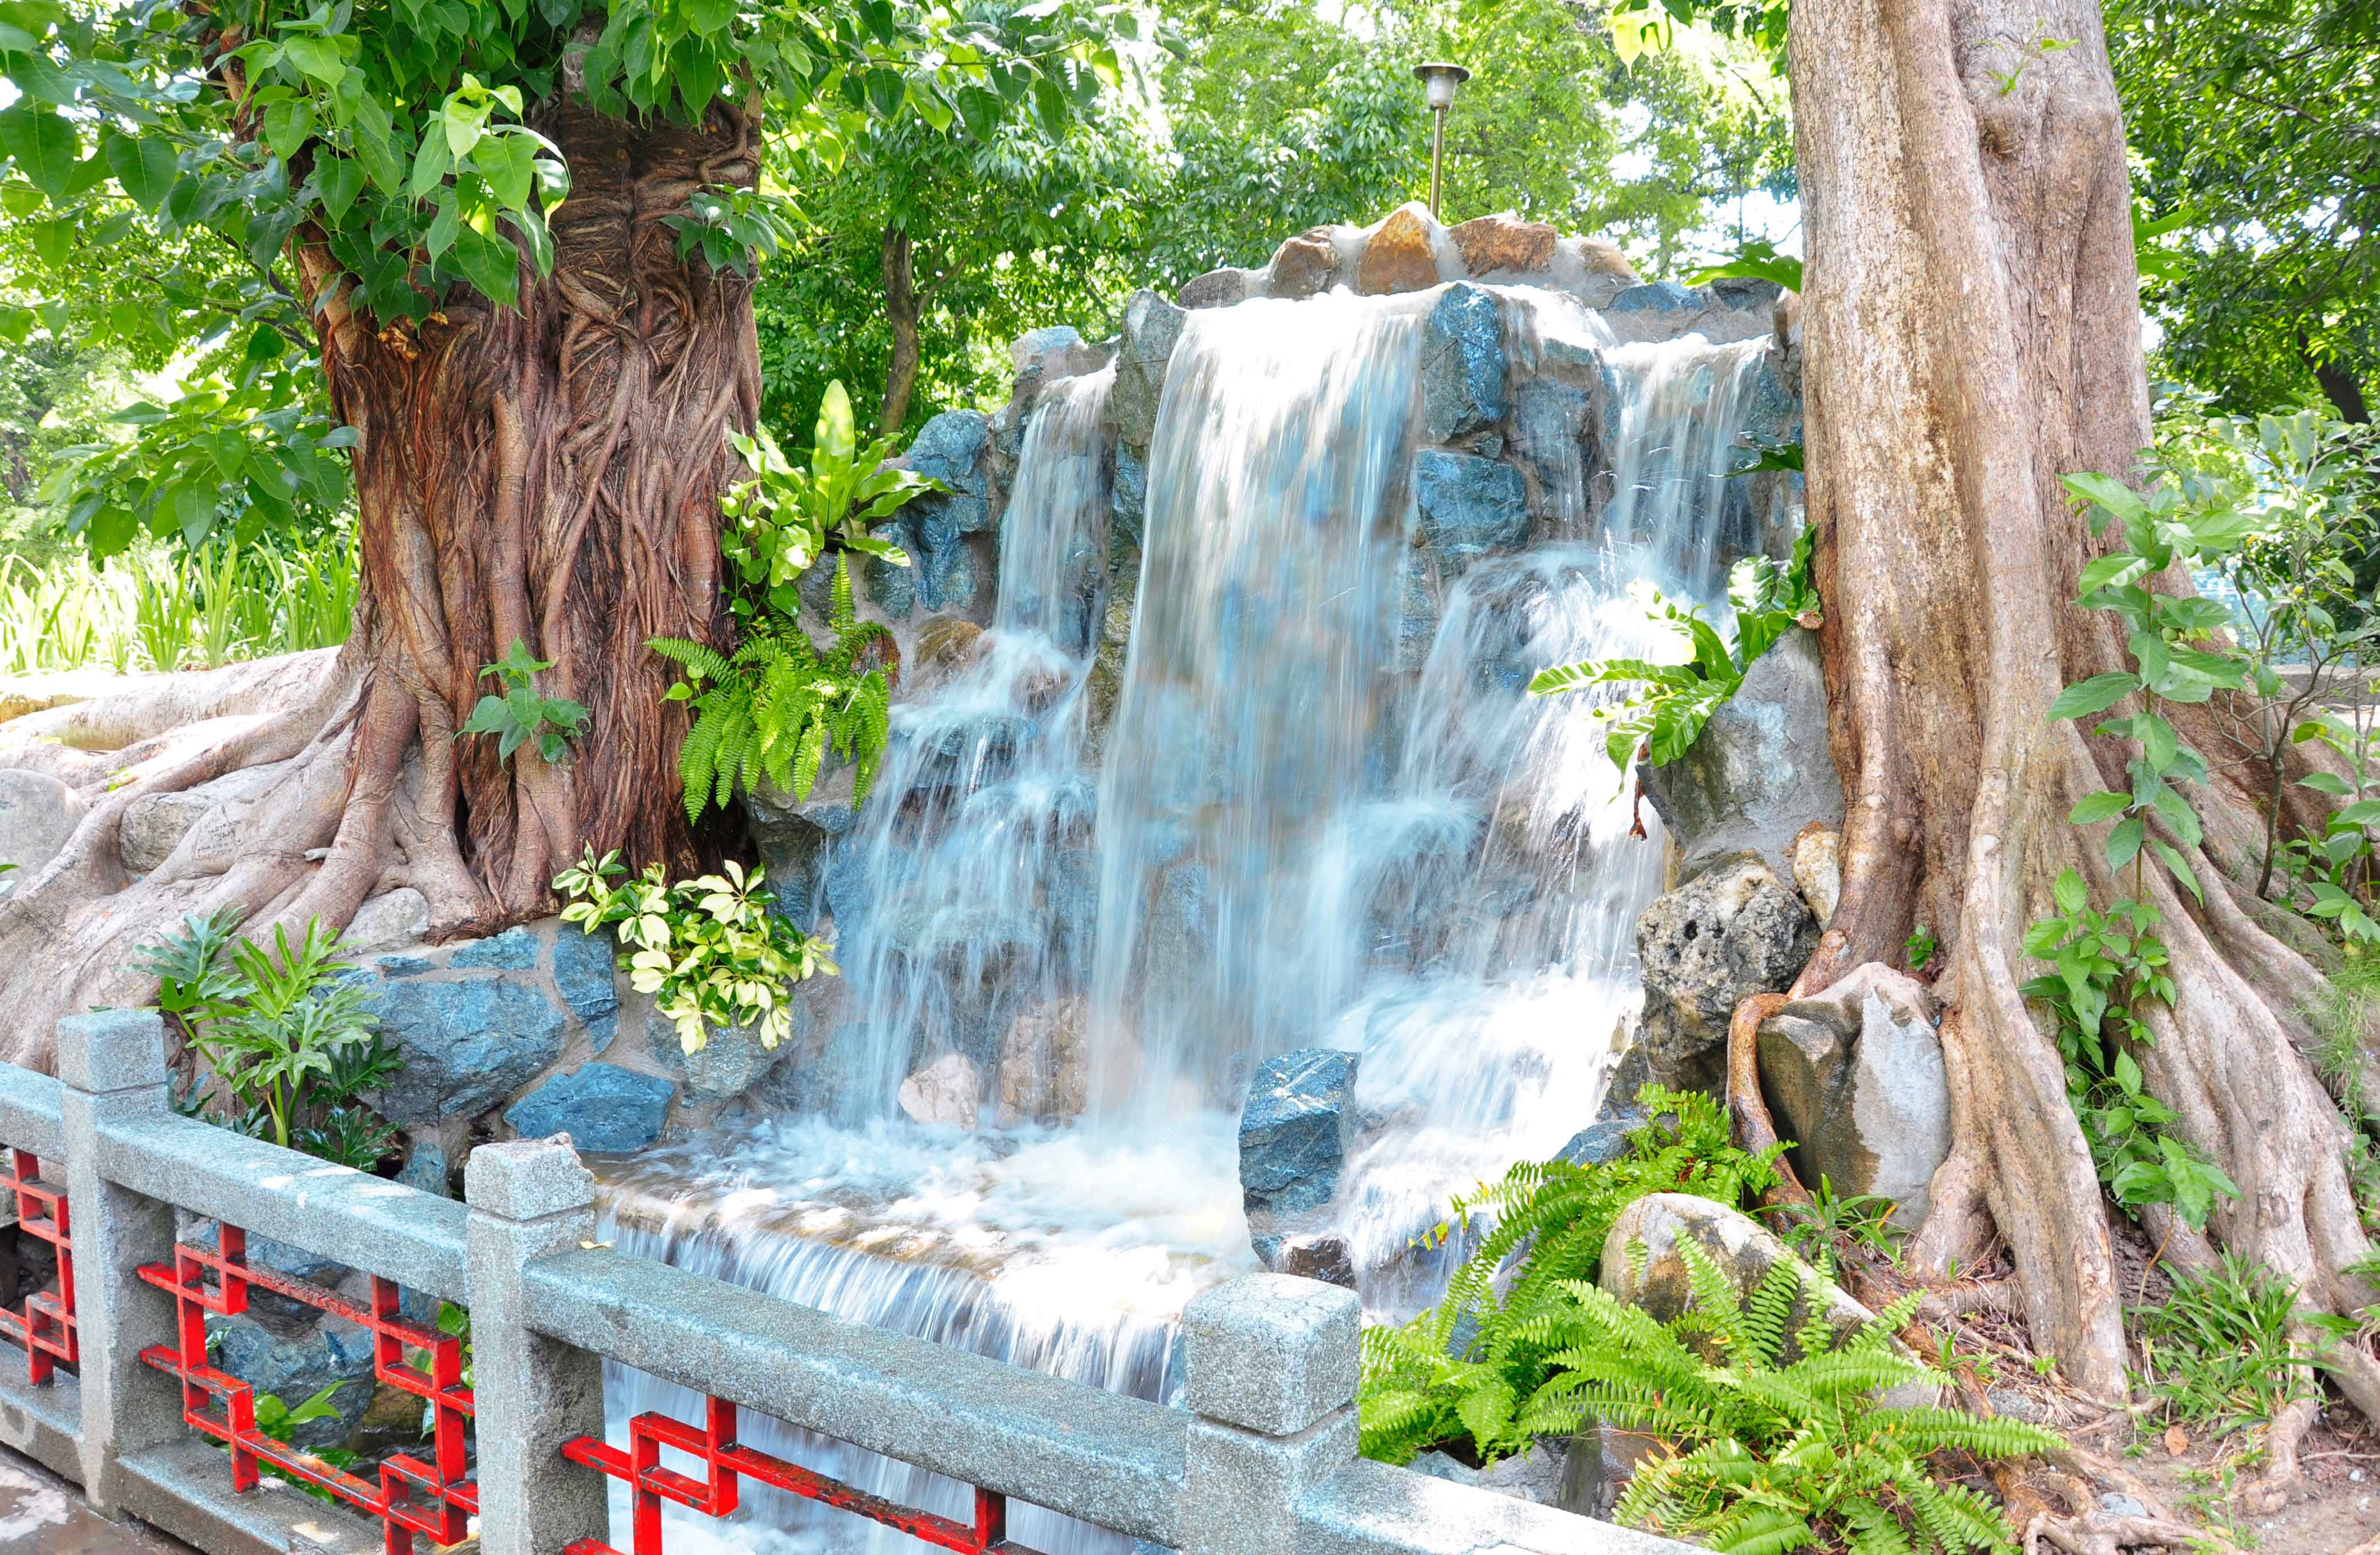 chinese garden waterfalls in luneta park manila philippine picture - Beautiful Flower Gardens Waterfalls